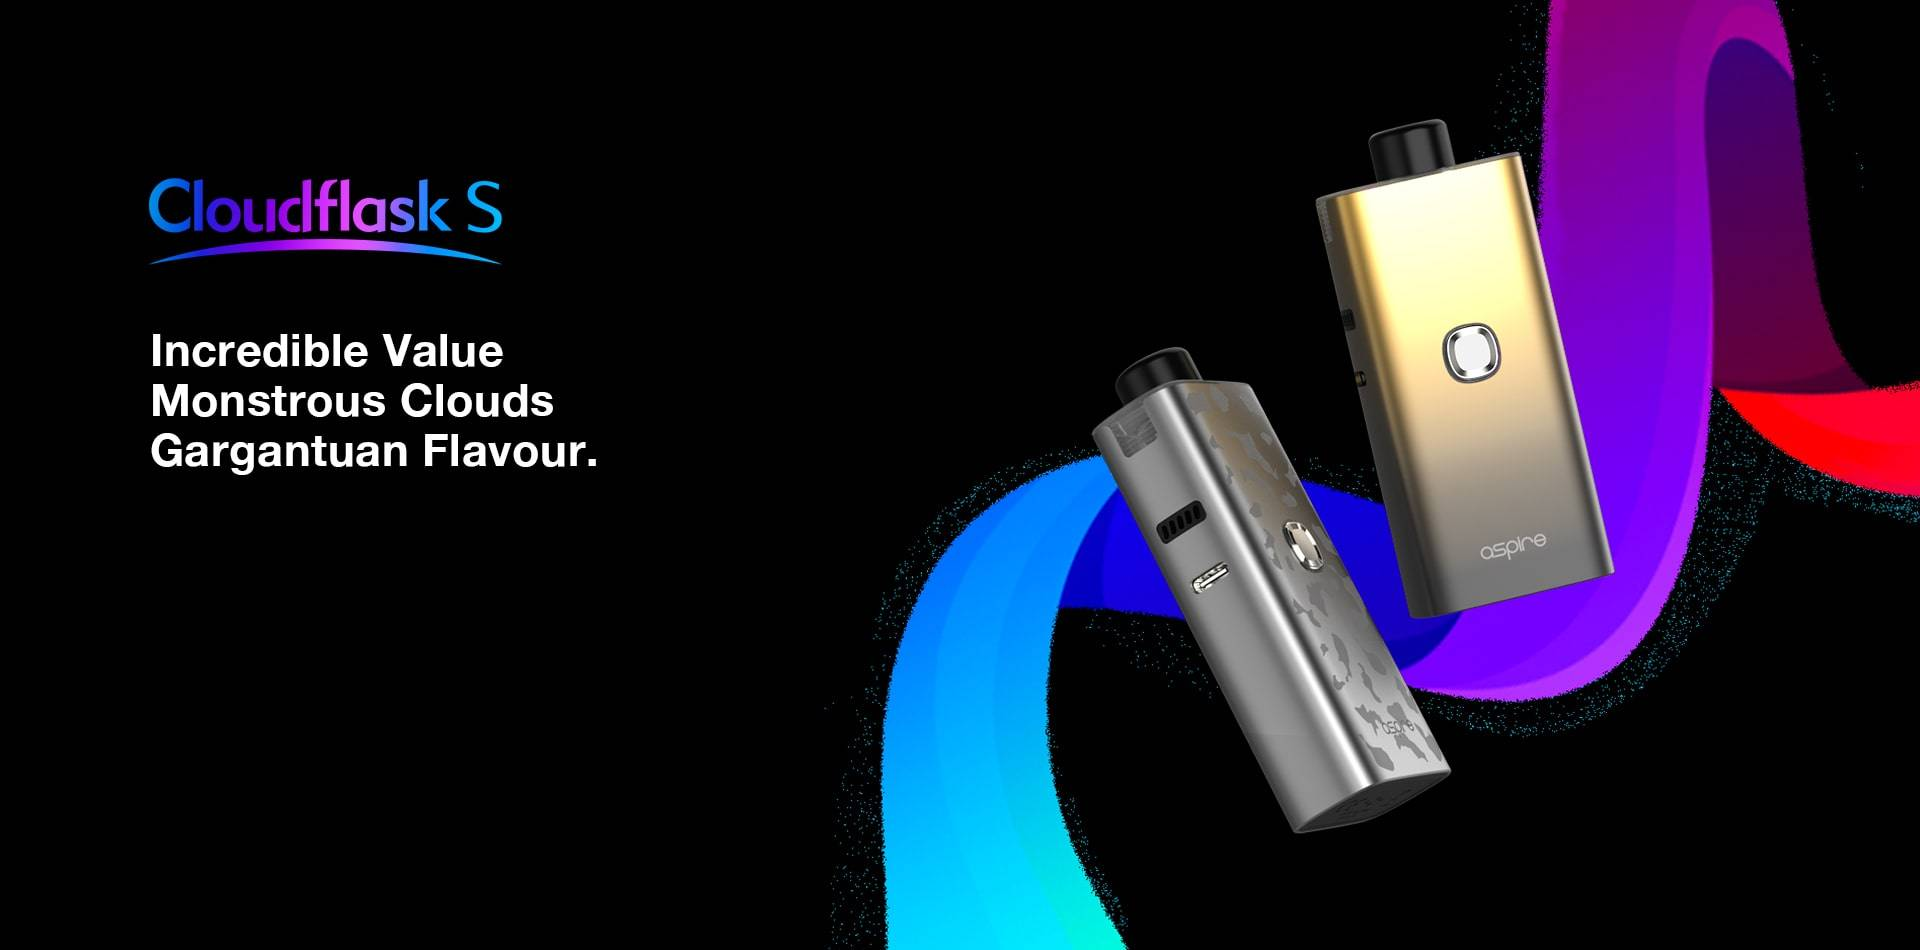 aspire-cloudflask-s-kit-uk.jpg